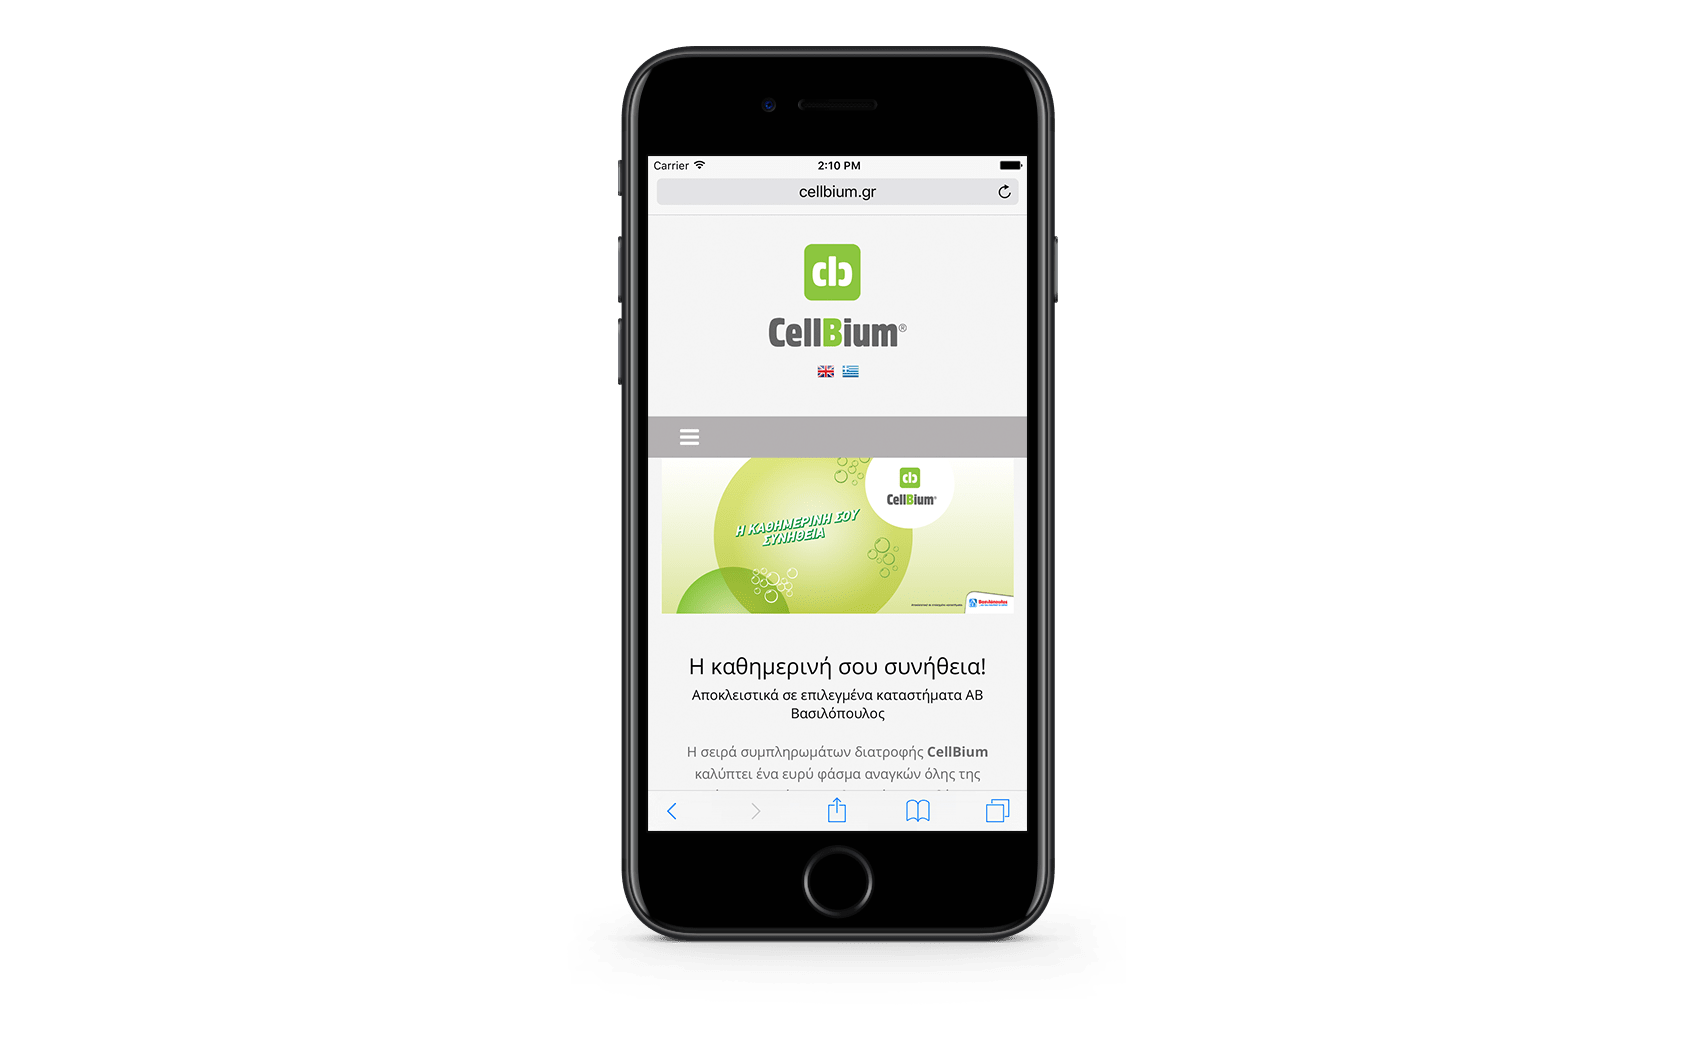 cellbium.gr